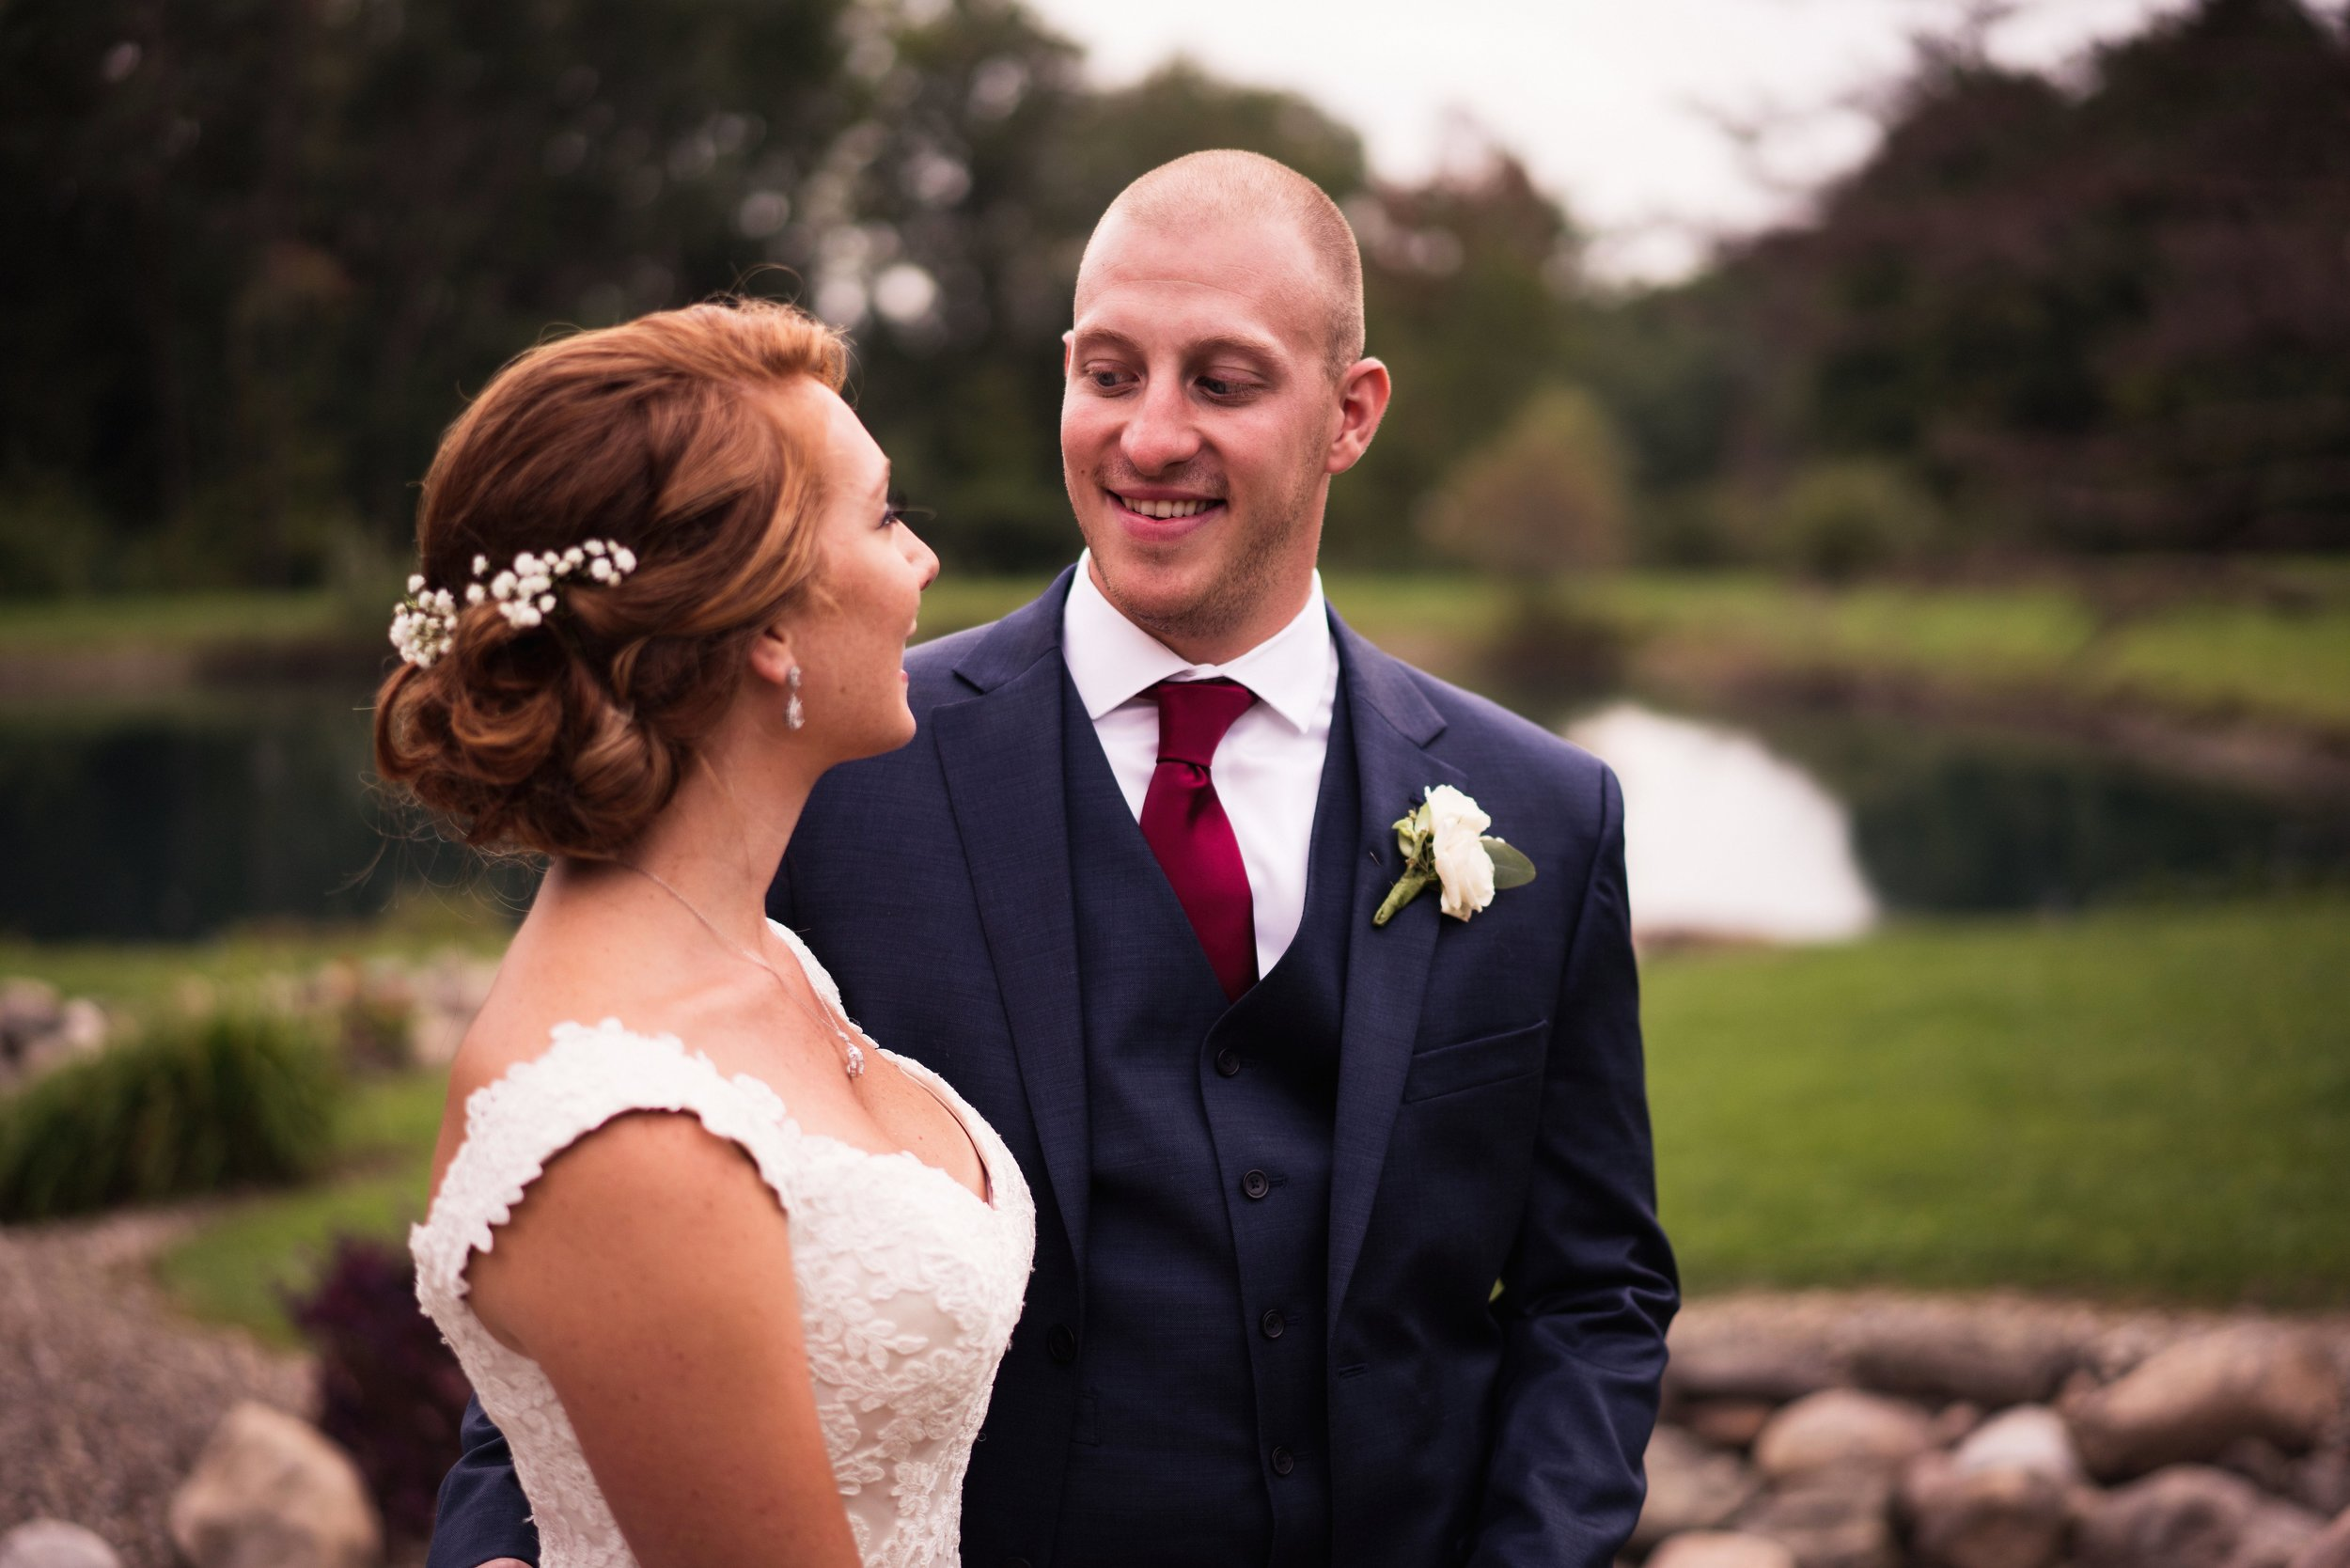 Blog-Lisa-James-Wedding-at Rosebud Estate Weddings in Arcade NY by Stefan-Ludwig-Photography-Buffalo-NY-59-x.jpg